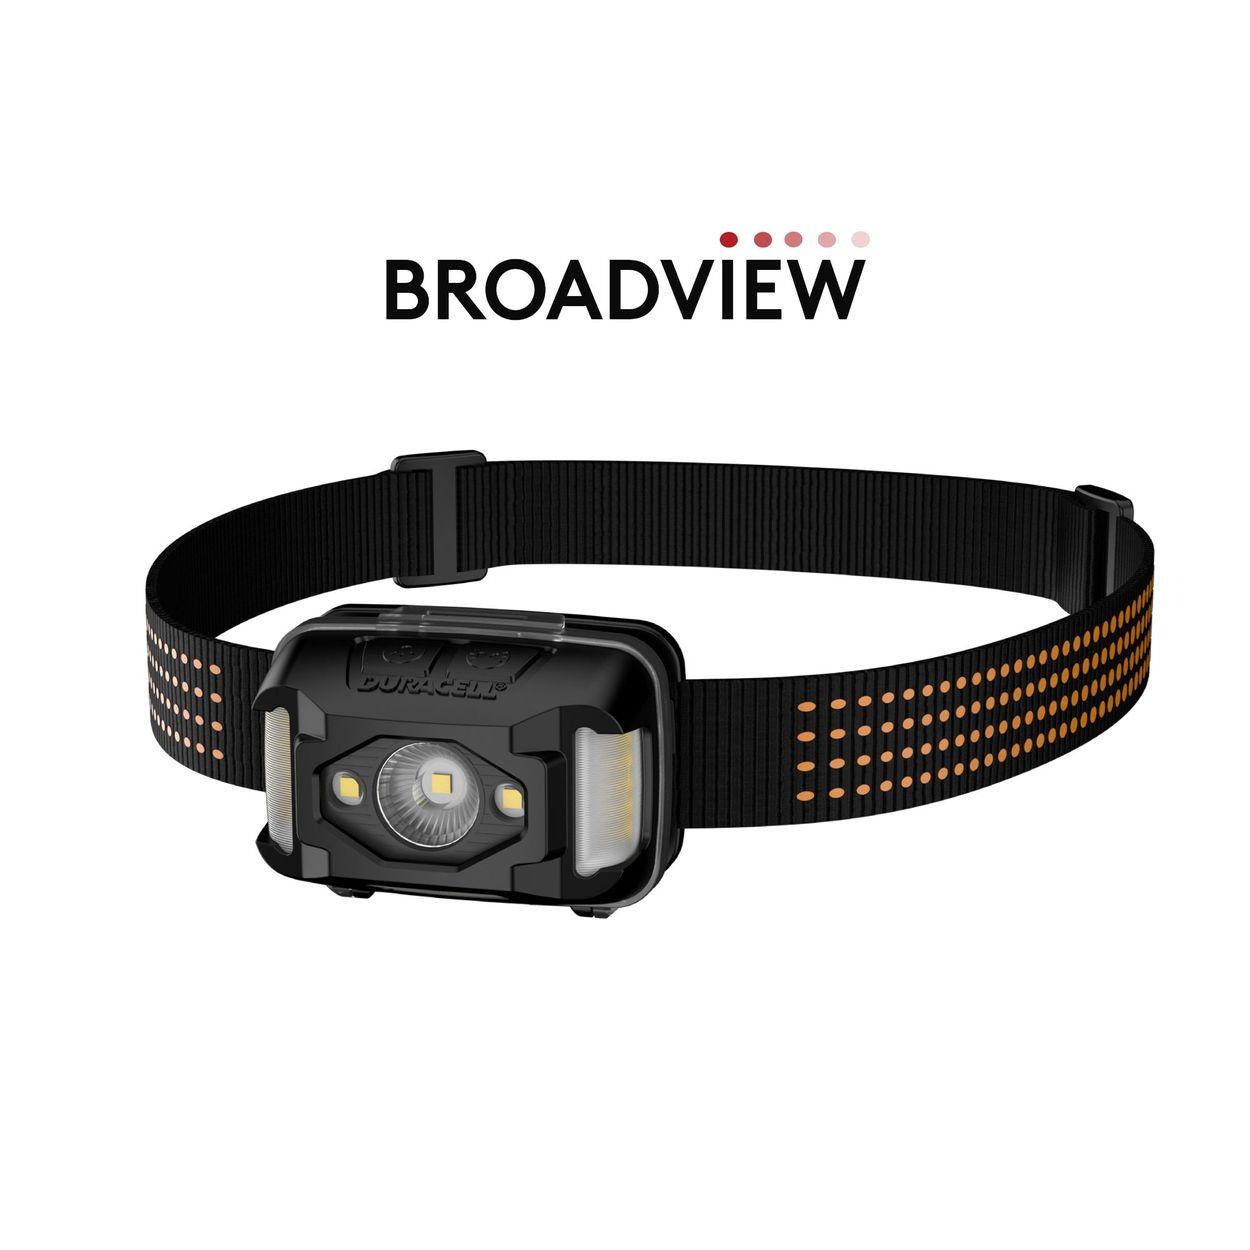 Broadview